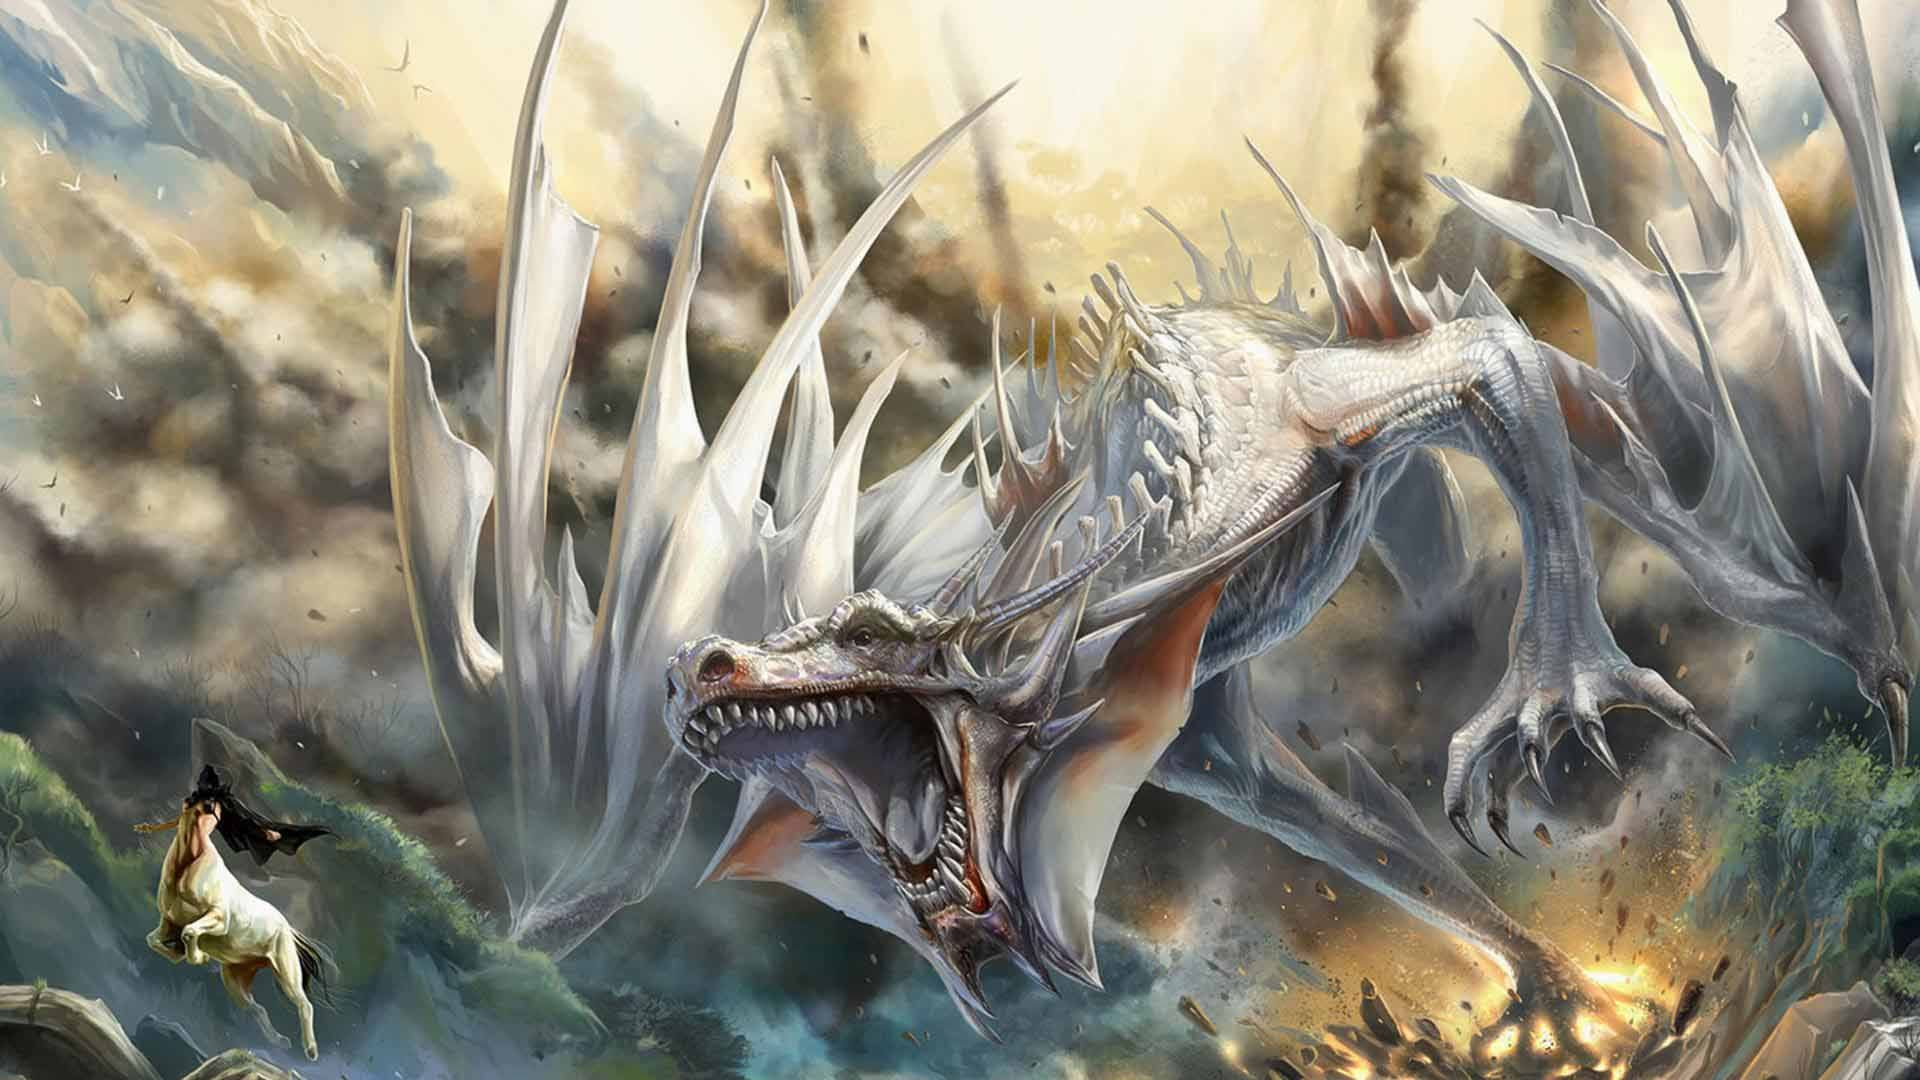 Dragon Fantasy Hd Wallpapers Deep Hd Wallpapers For You Hd 1920 1080 Dragon Hd Wallpapers 1080p 52 Wallp Dragon Pictures Fantasy Dragon Gold Dragon Wallpaper